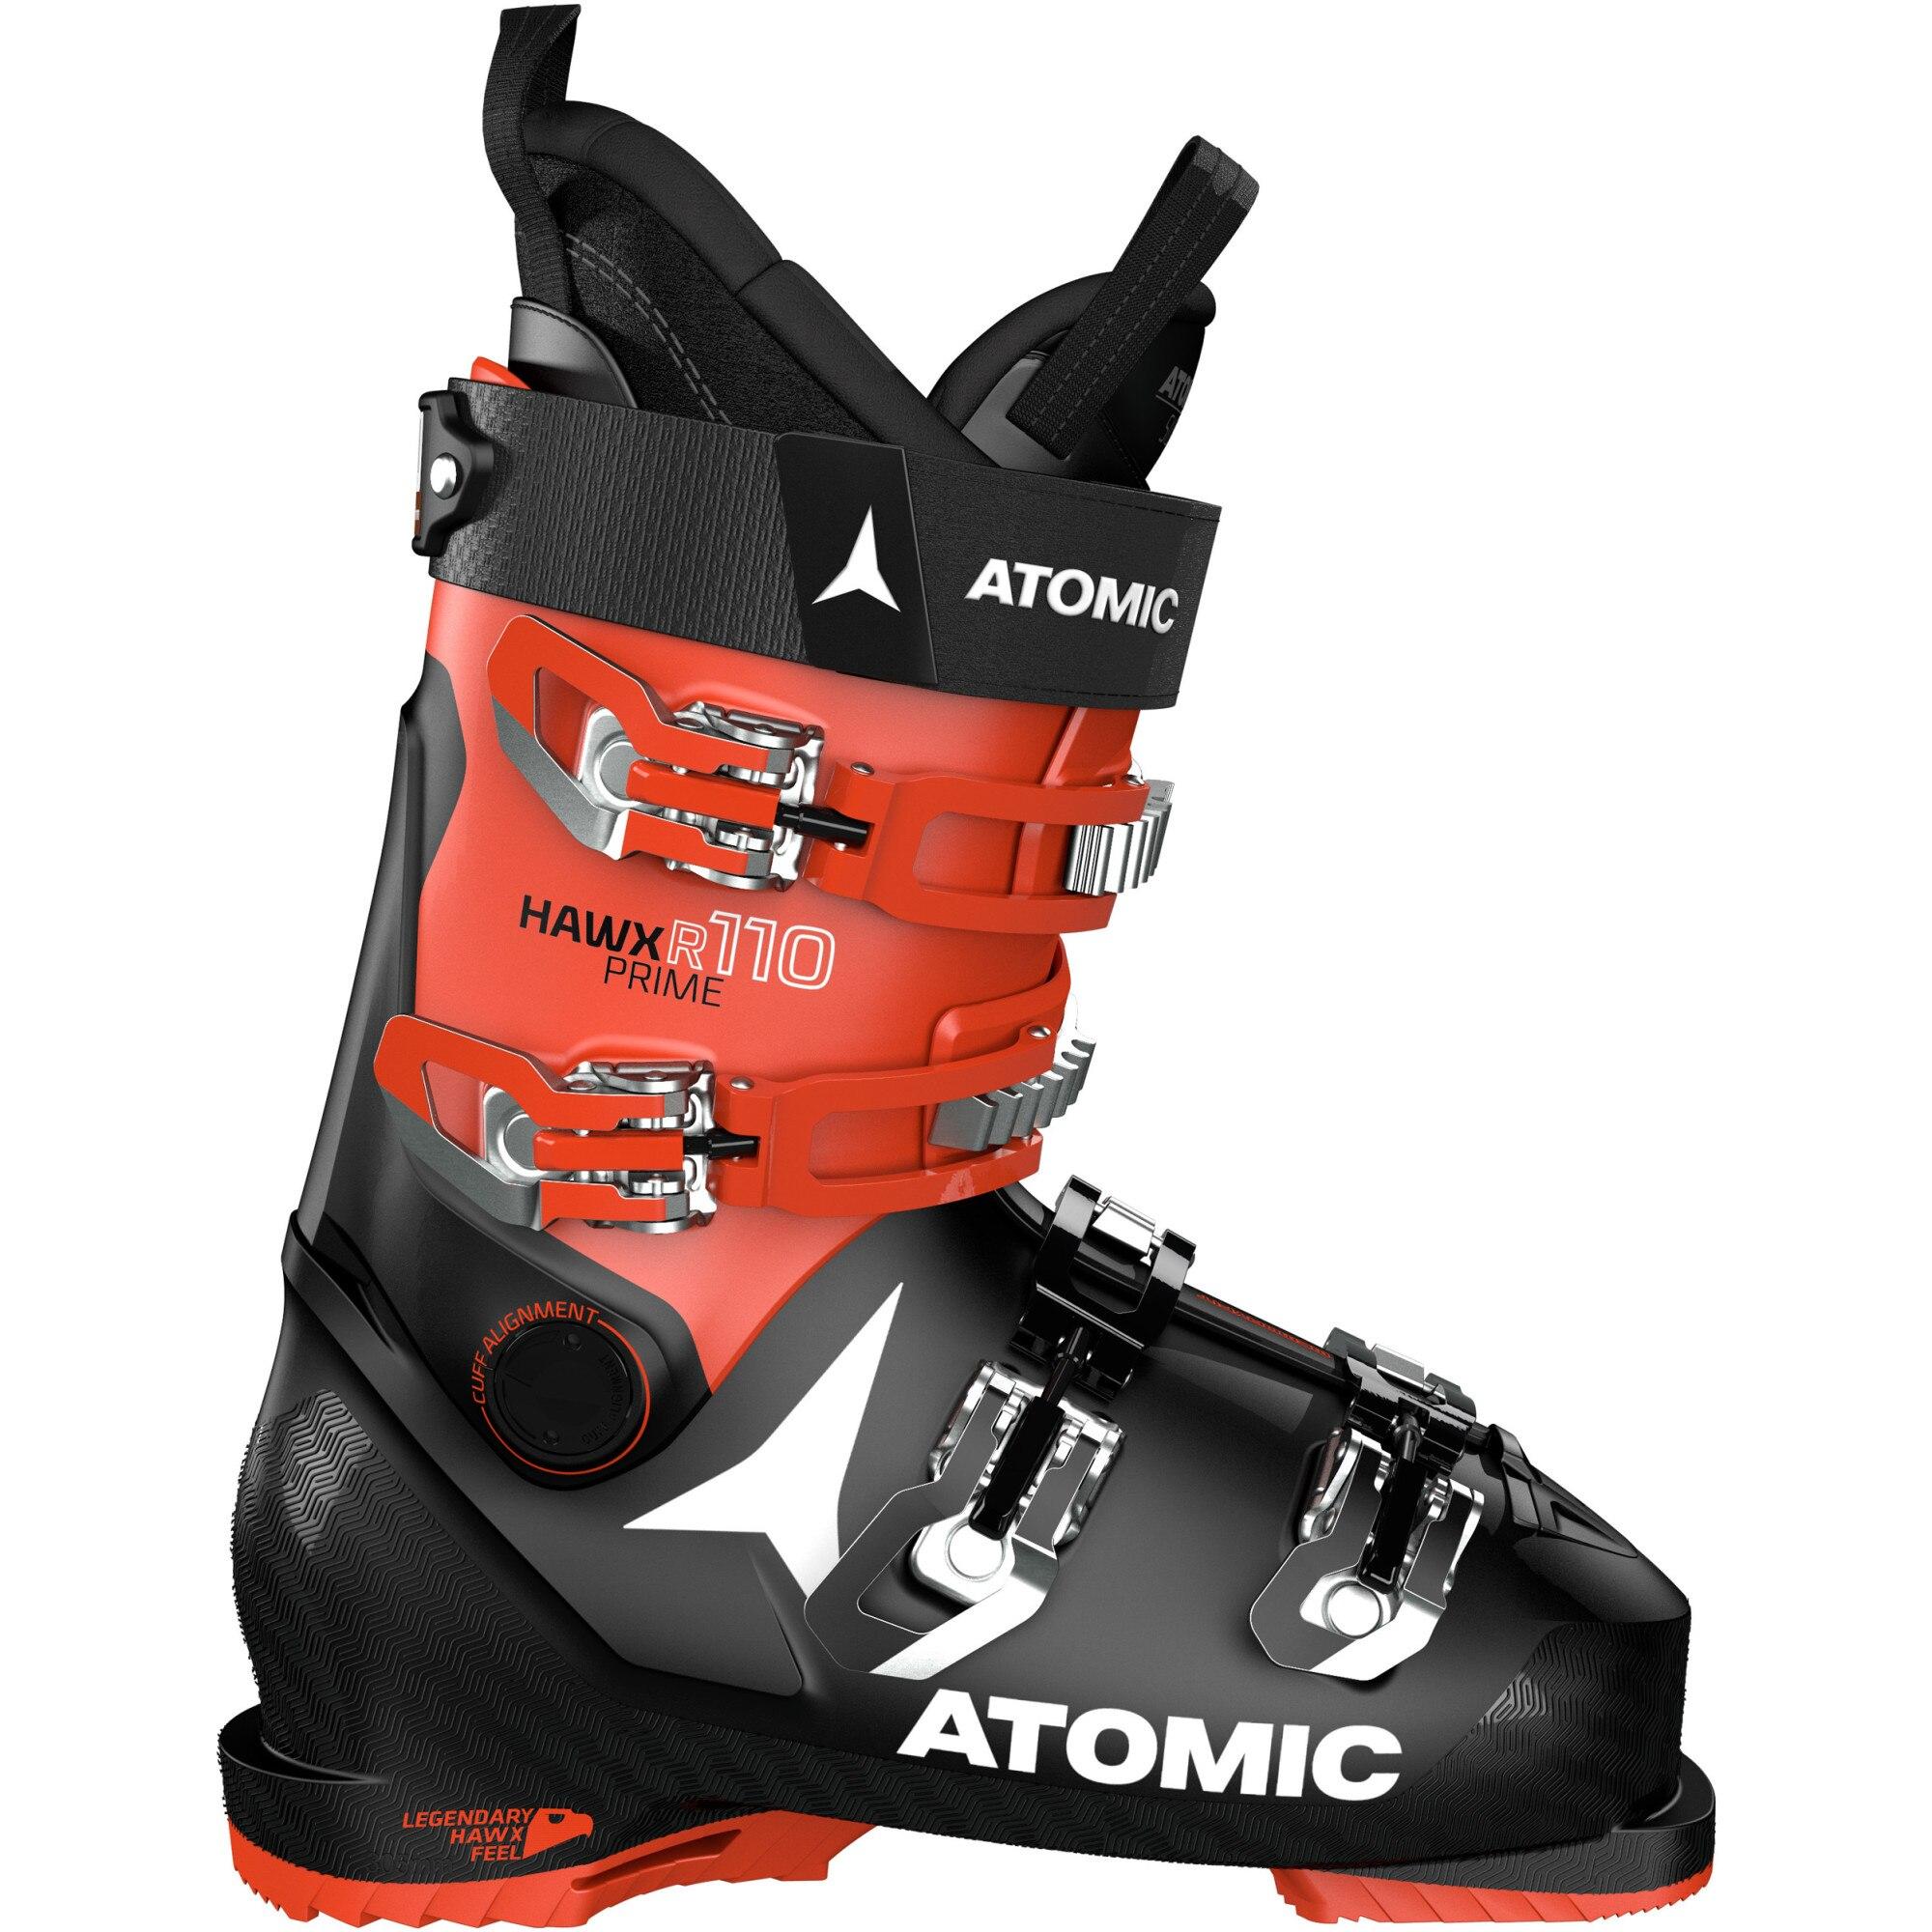 Fotografie Clapari ski Atomic Hawx Prime R110,Barbati,Negru/Rosu,29/29.5